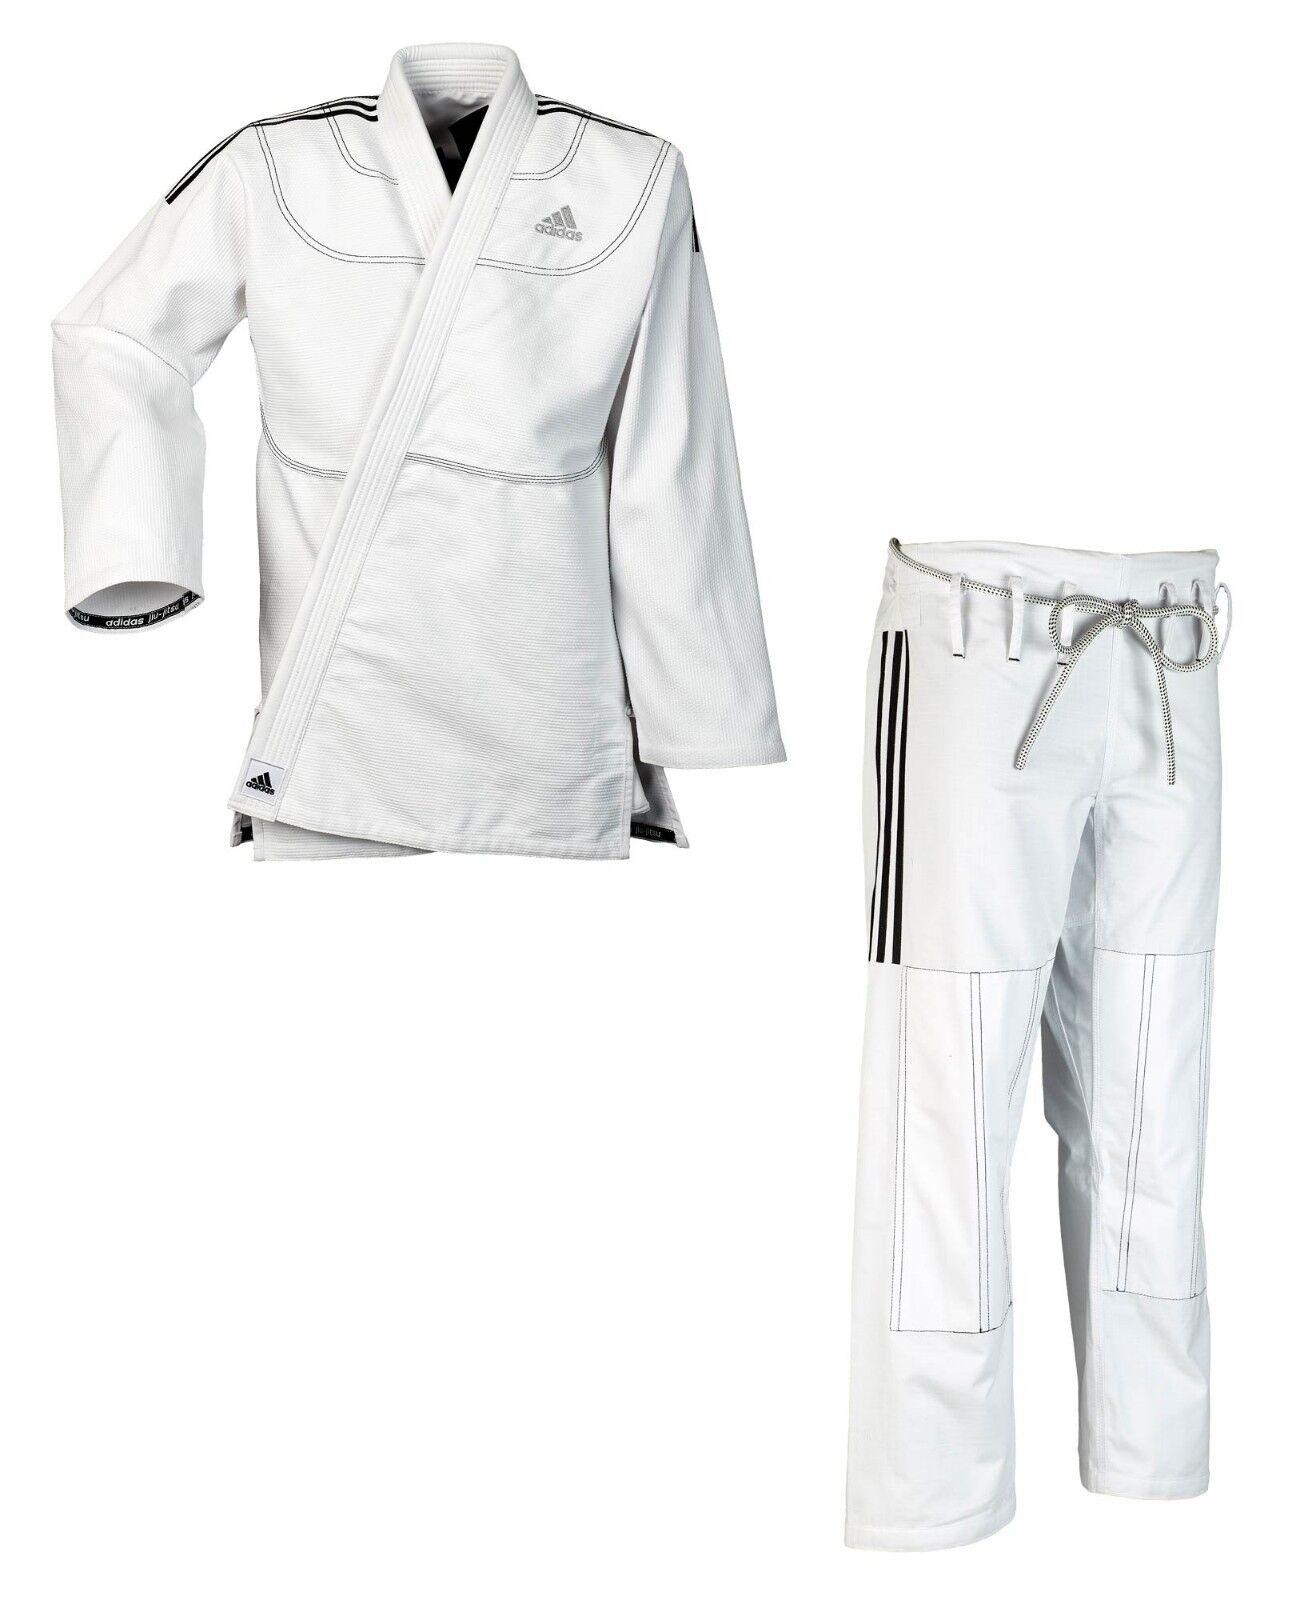 Adidas BJJ Anzug  Contest 2.0  weiß JJ430 Jiu-Jitsu Kimono - BJJ-Gi - Ju-Jutsu